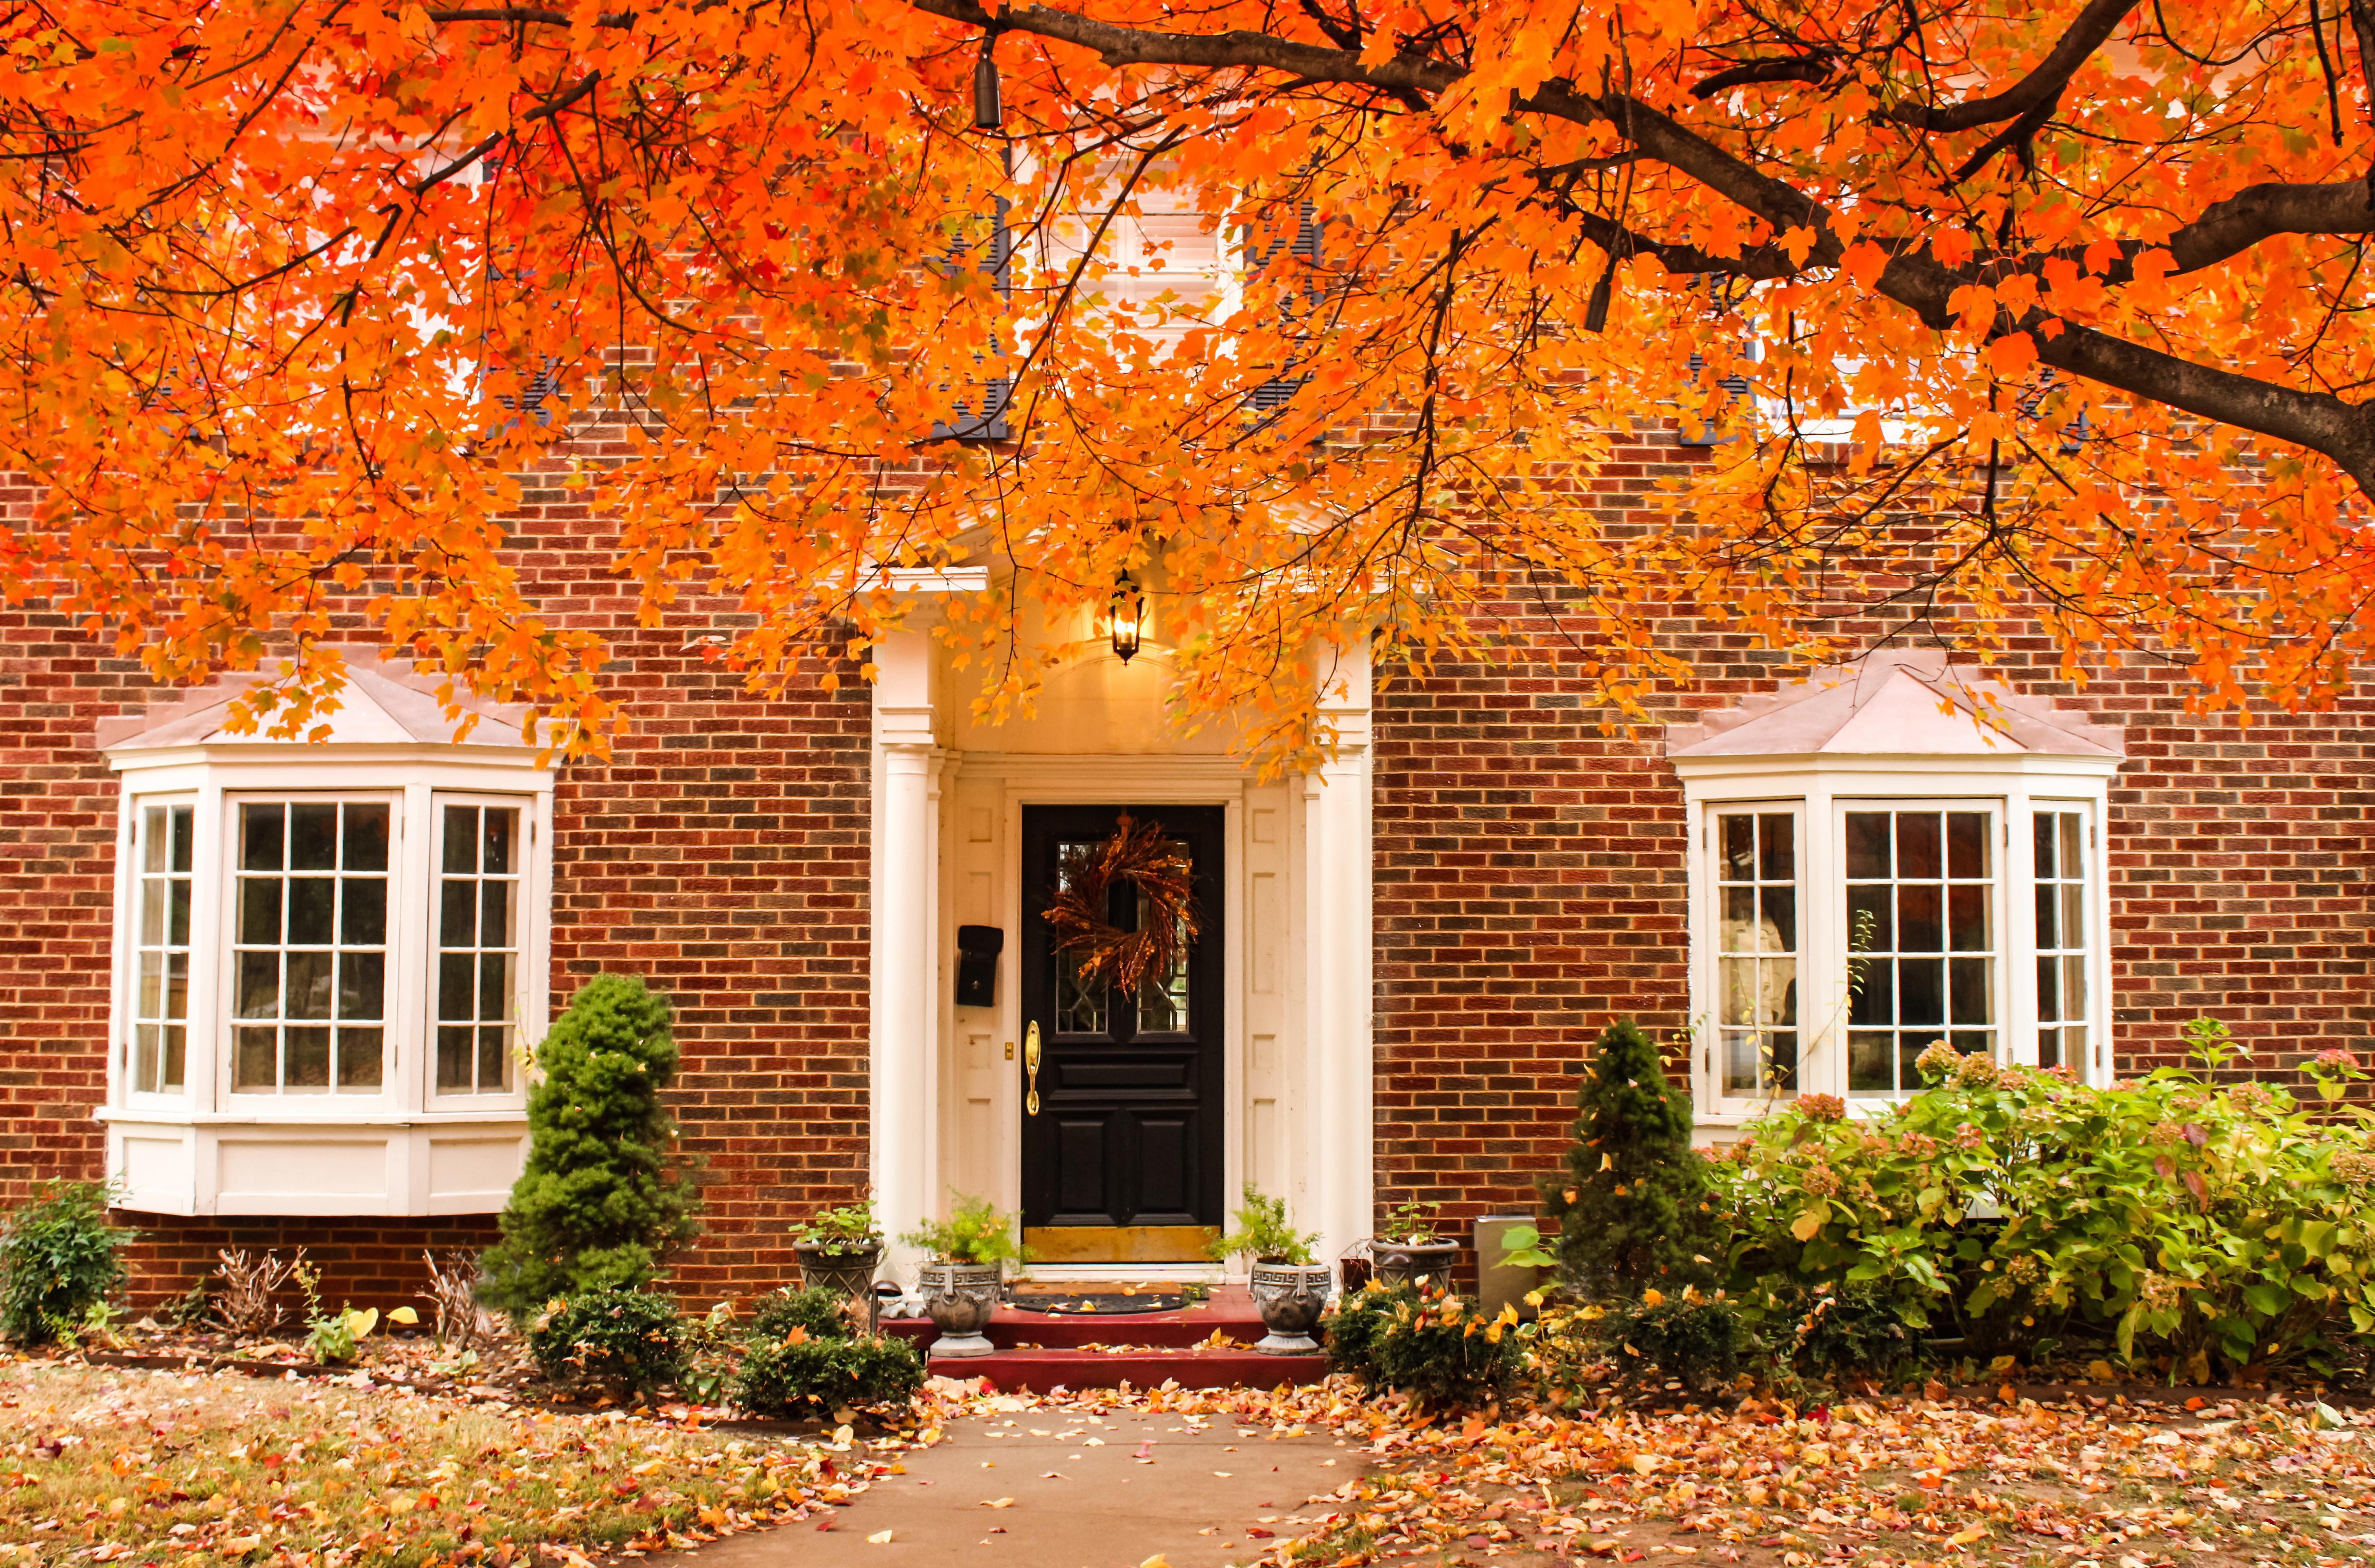 Home, Fall, Autumn, Leaves